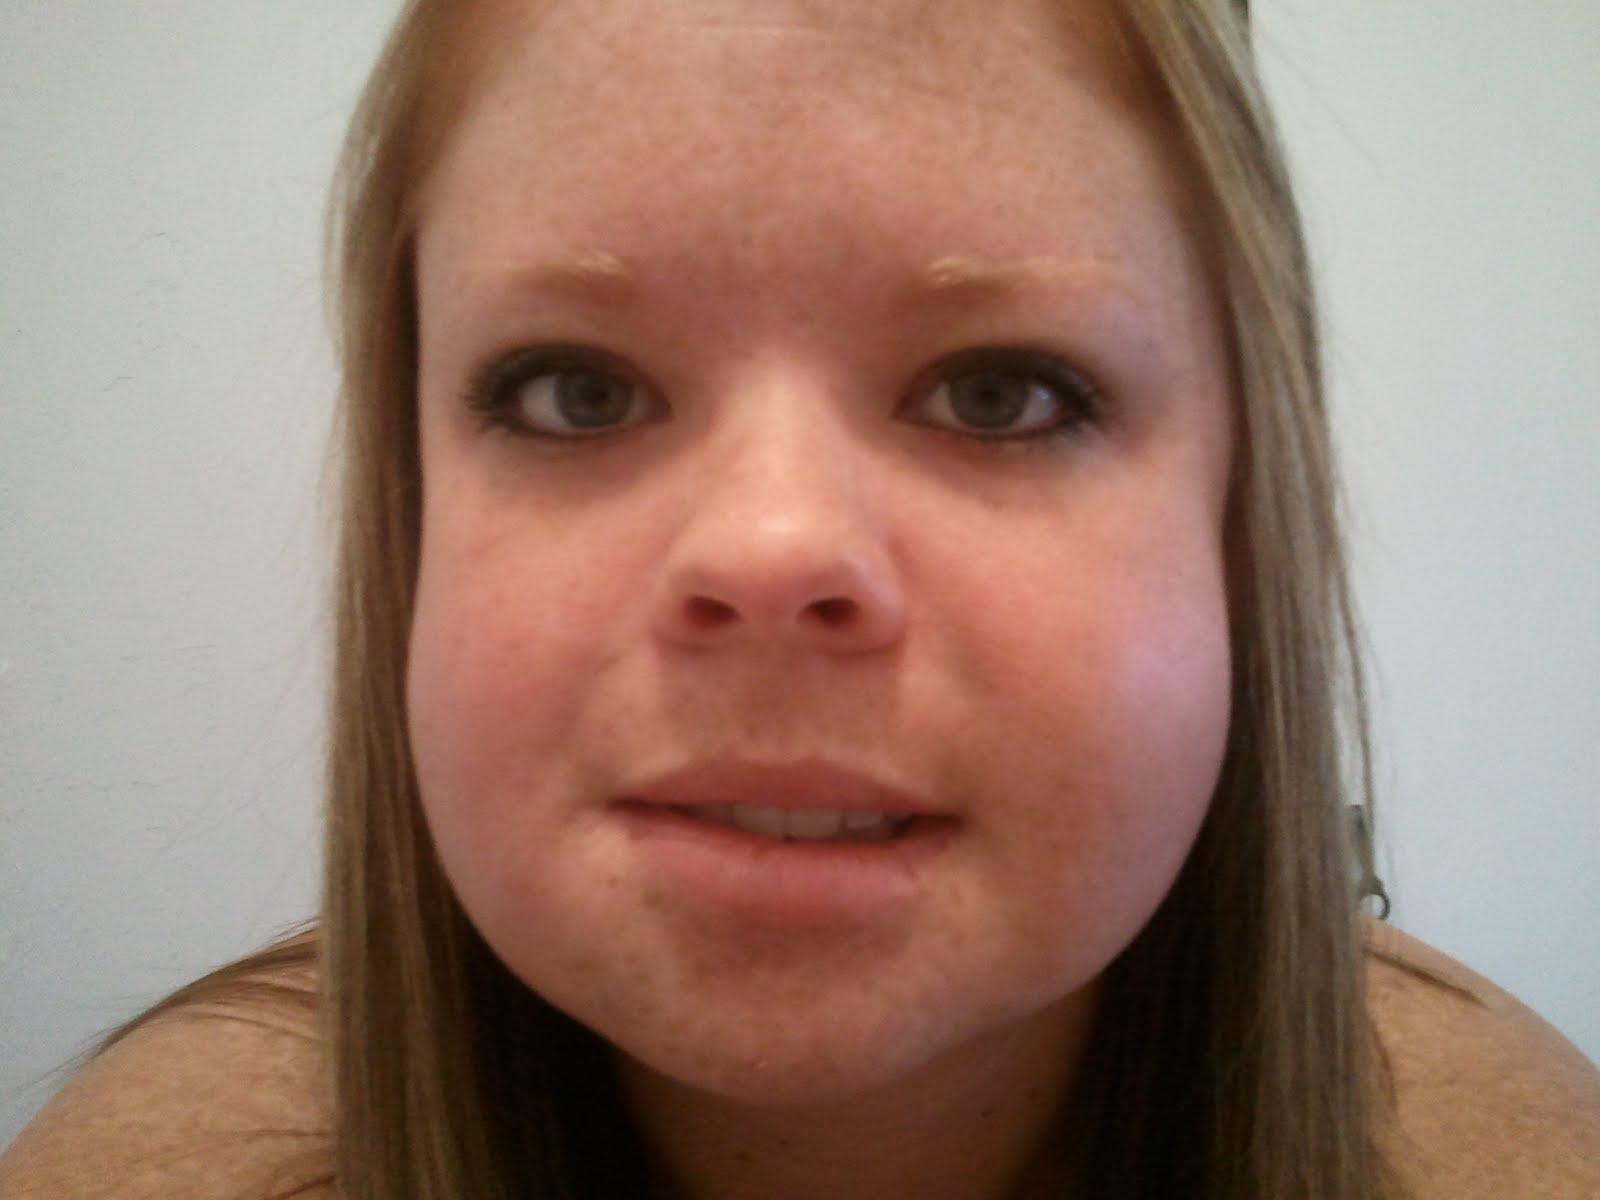 Wisdom Teeth Facial Swelling 36